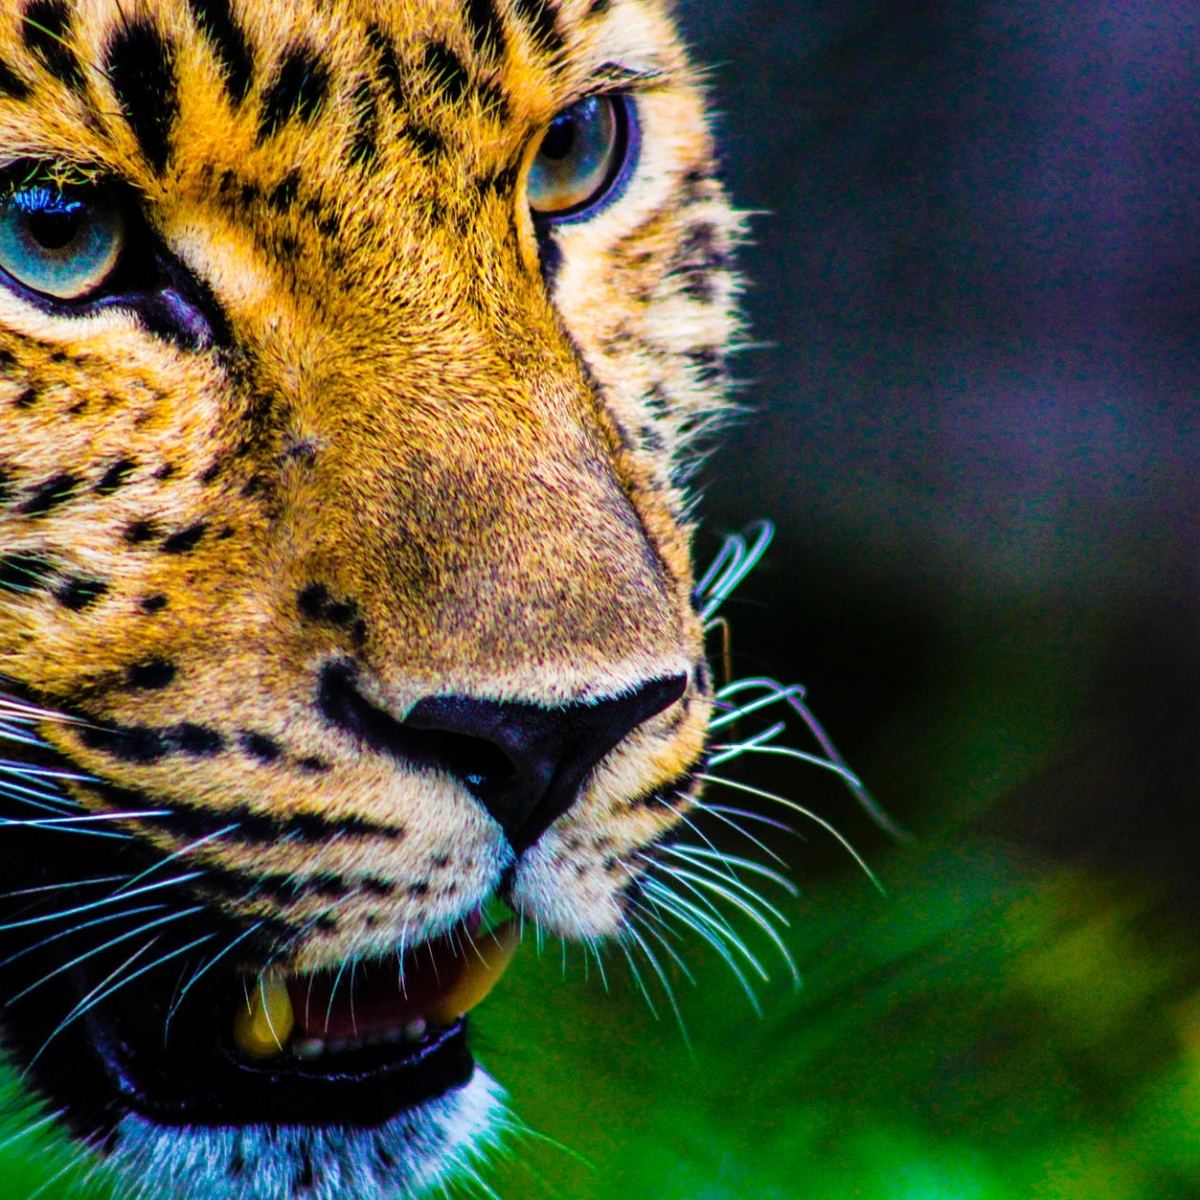 India prepared to bring back cheetah: Wildlife experts